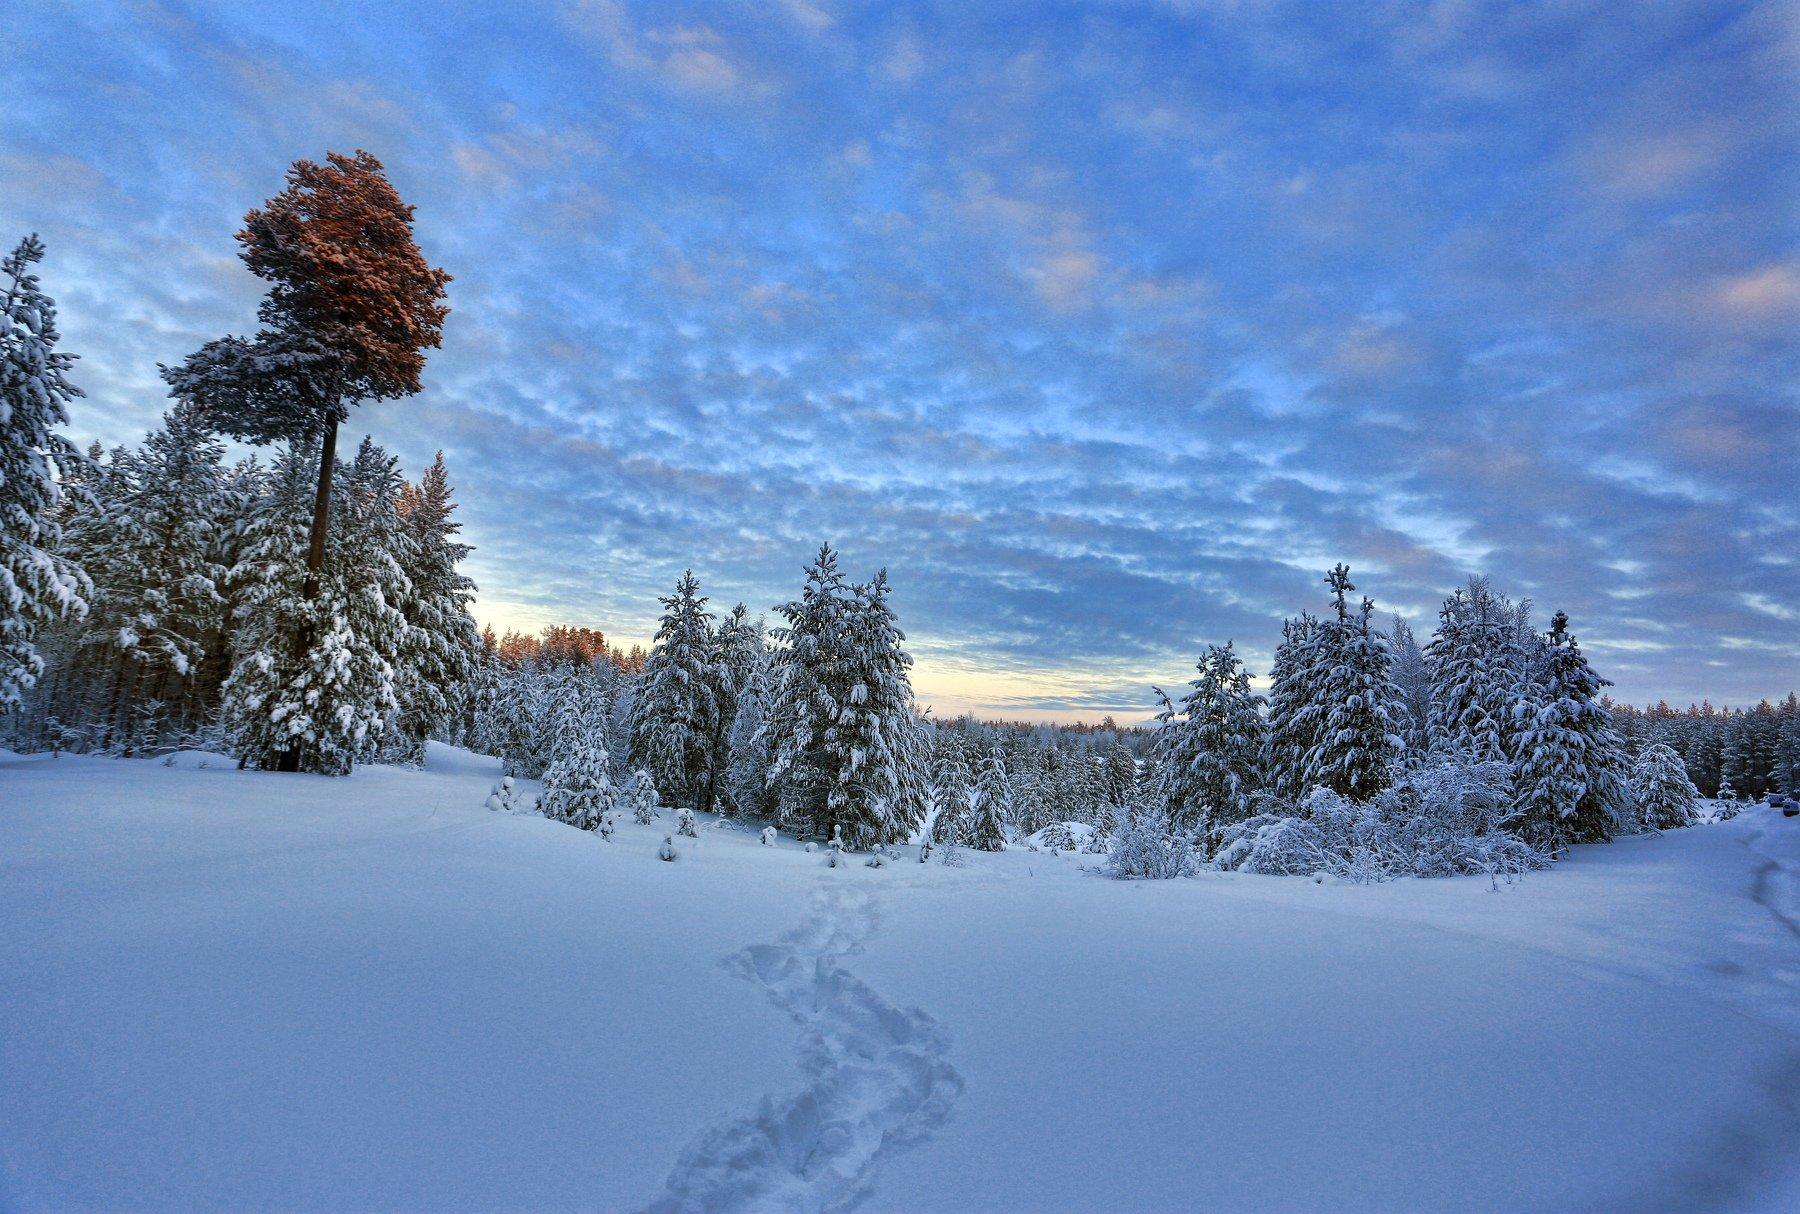 Закат, Небо, Север, Снег, Татьяна